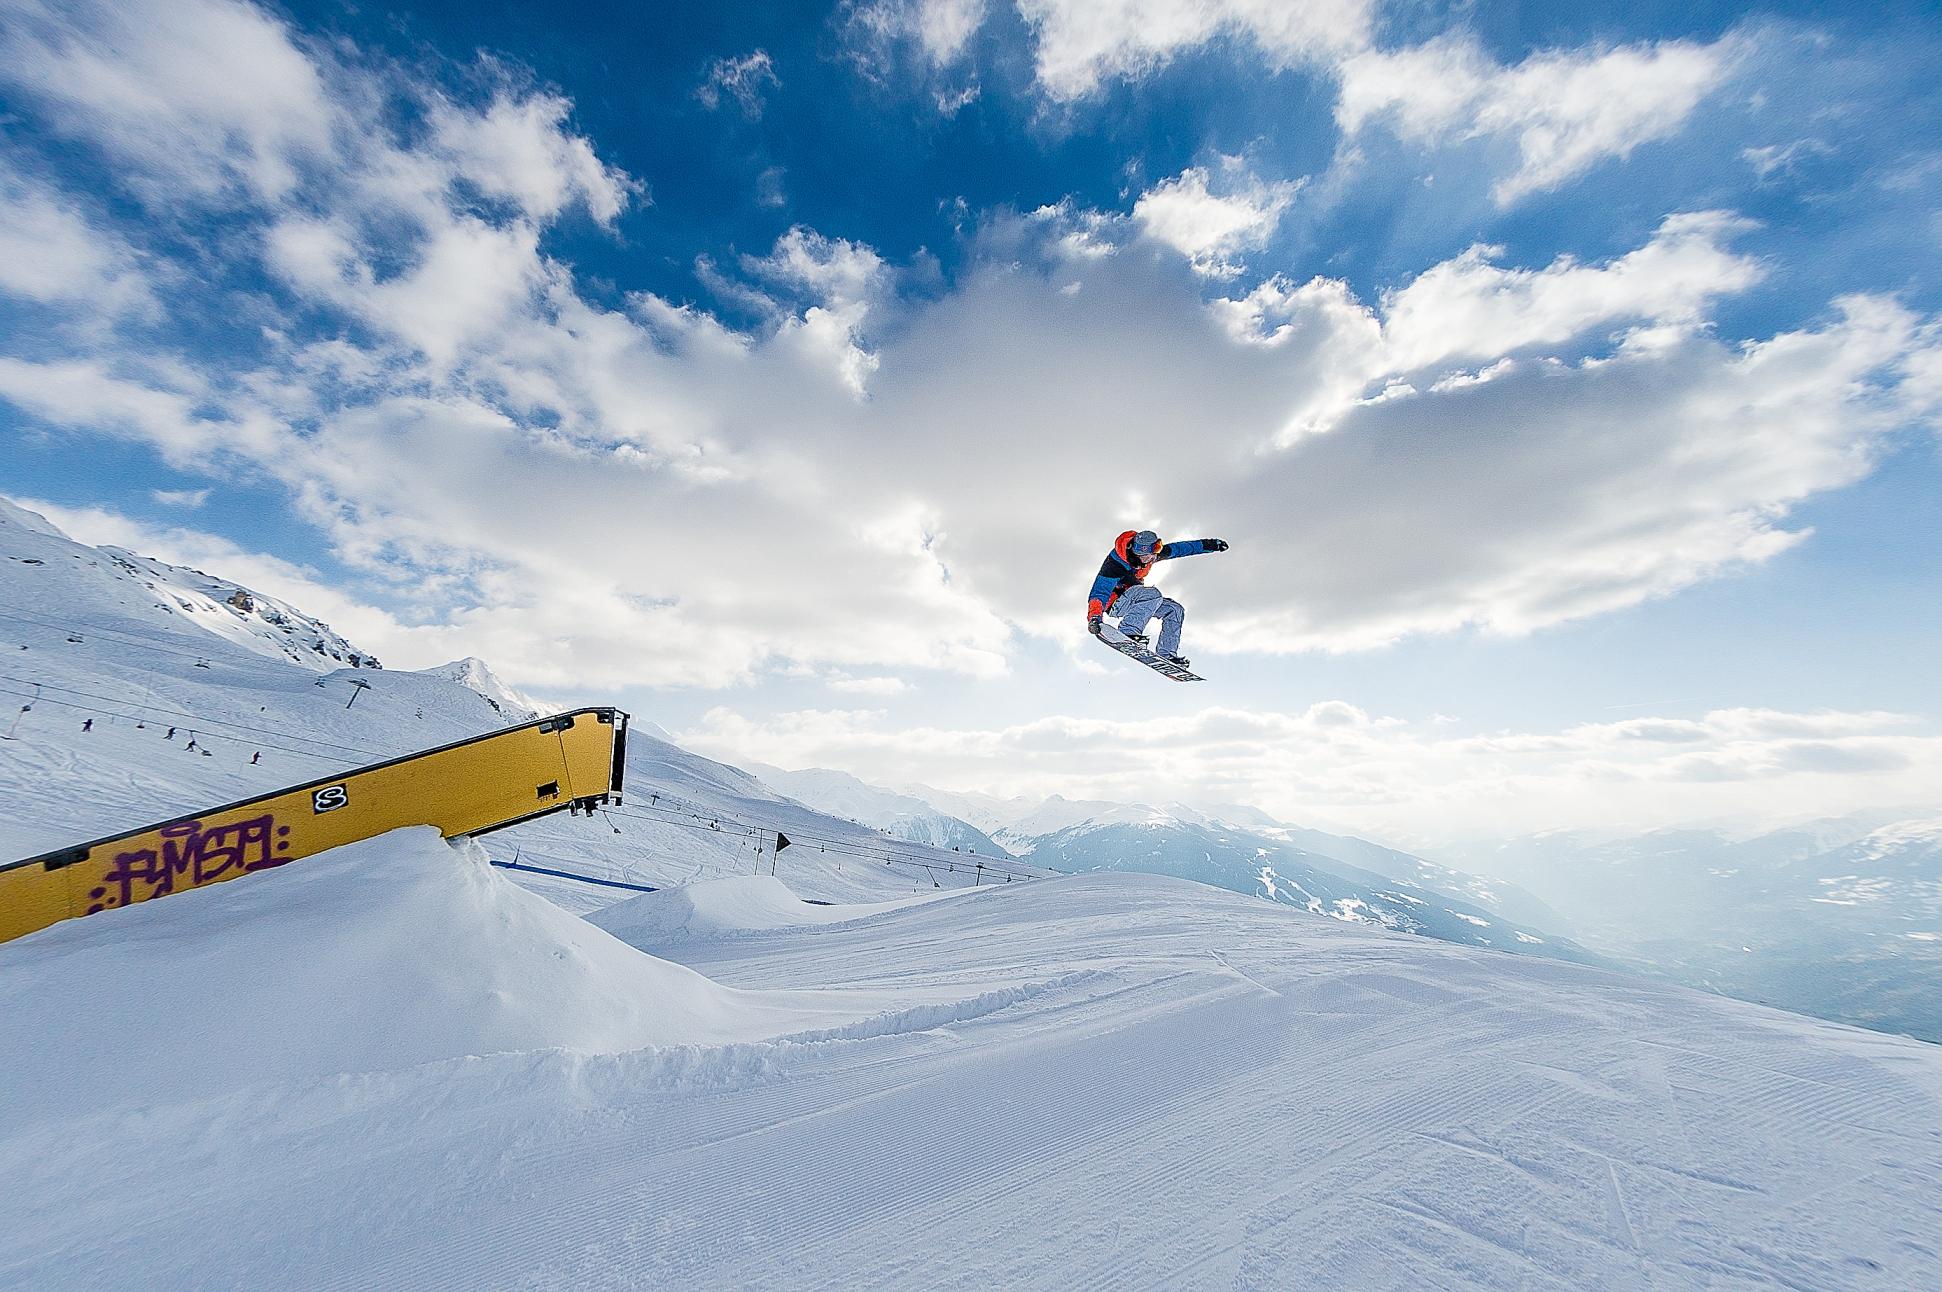 Activité ski enfant(c)ThomasHytteStephaneCervos